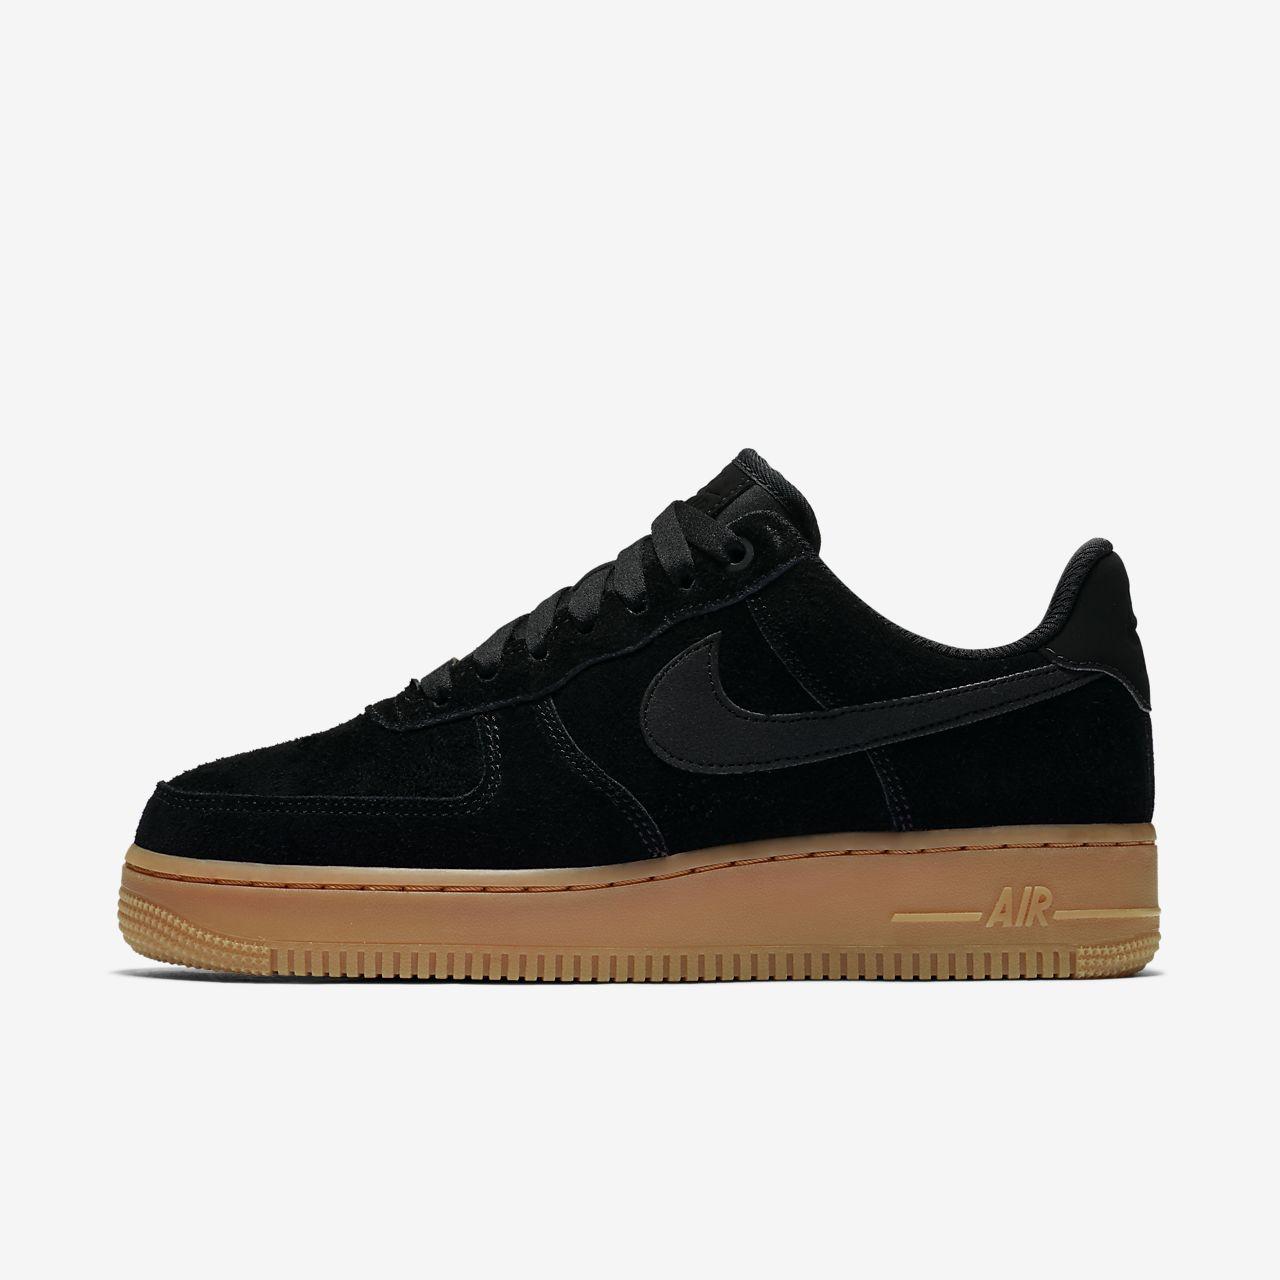 Dámská bota Nike Air Force 1 '07 SE Suede